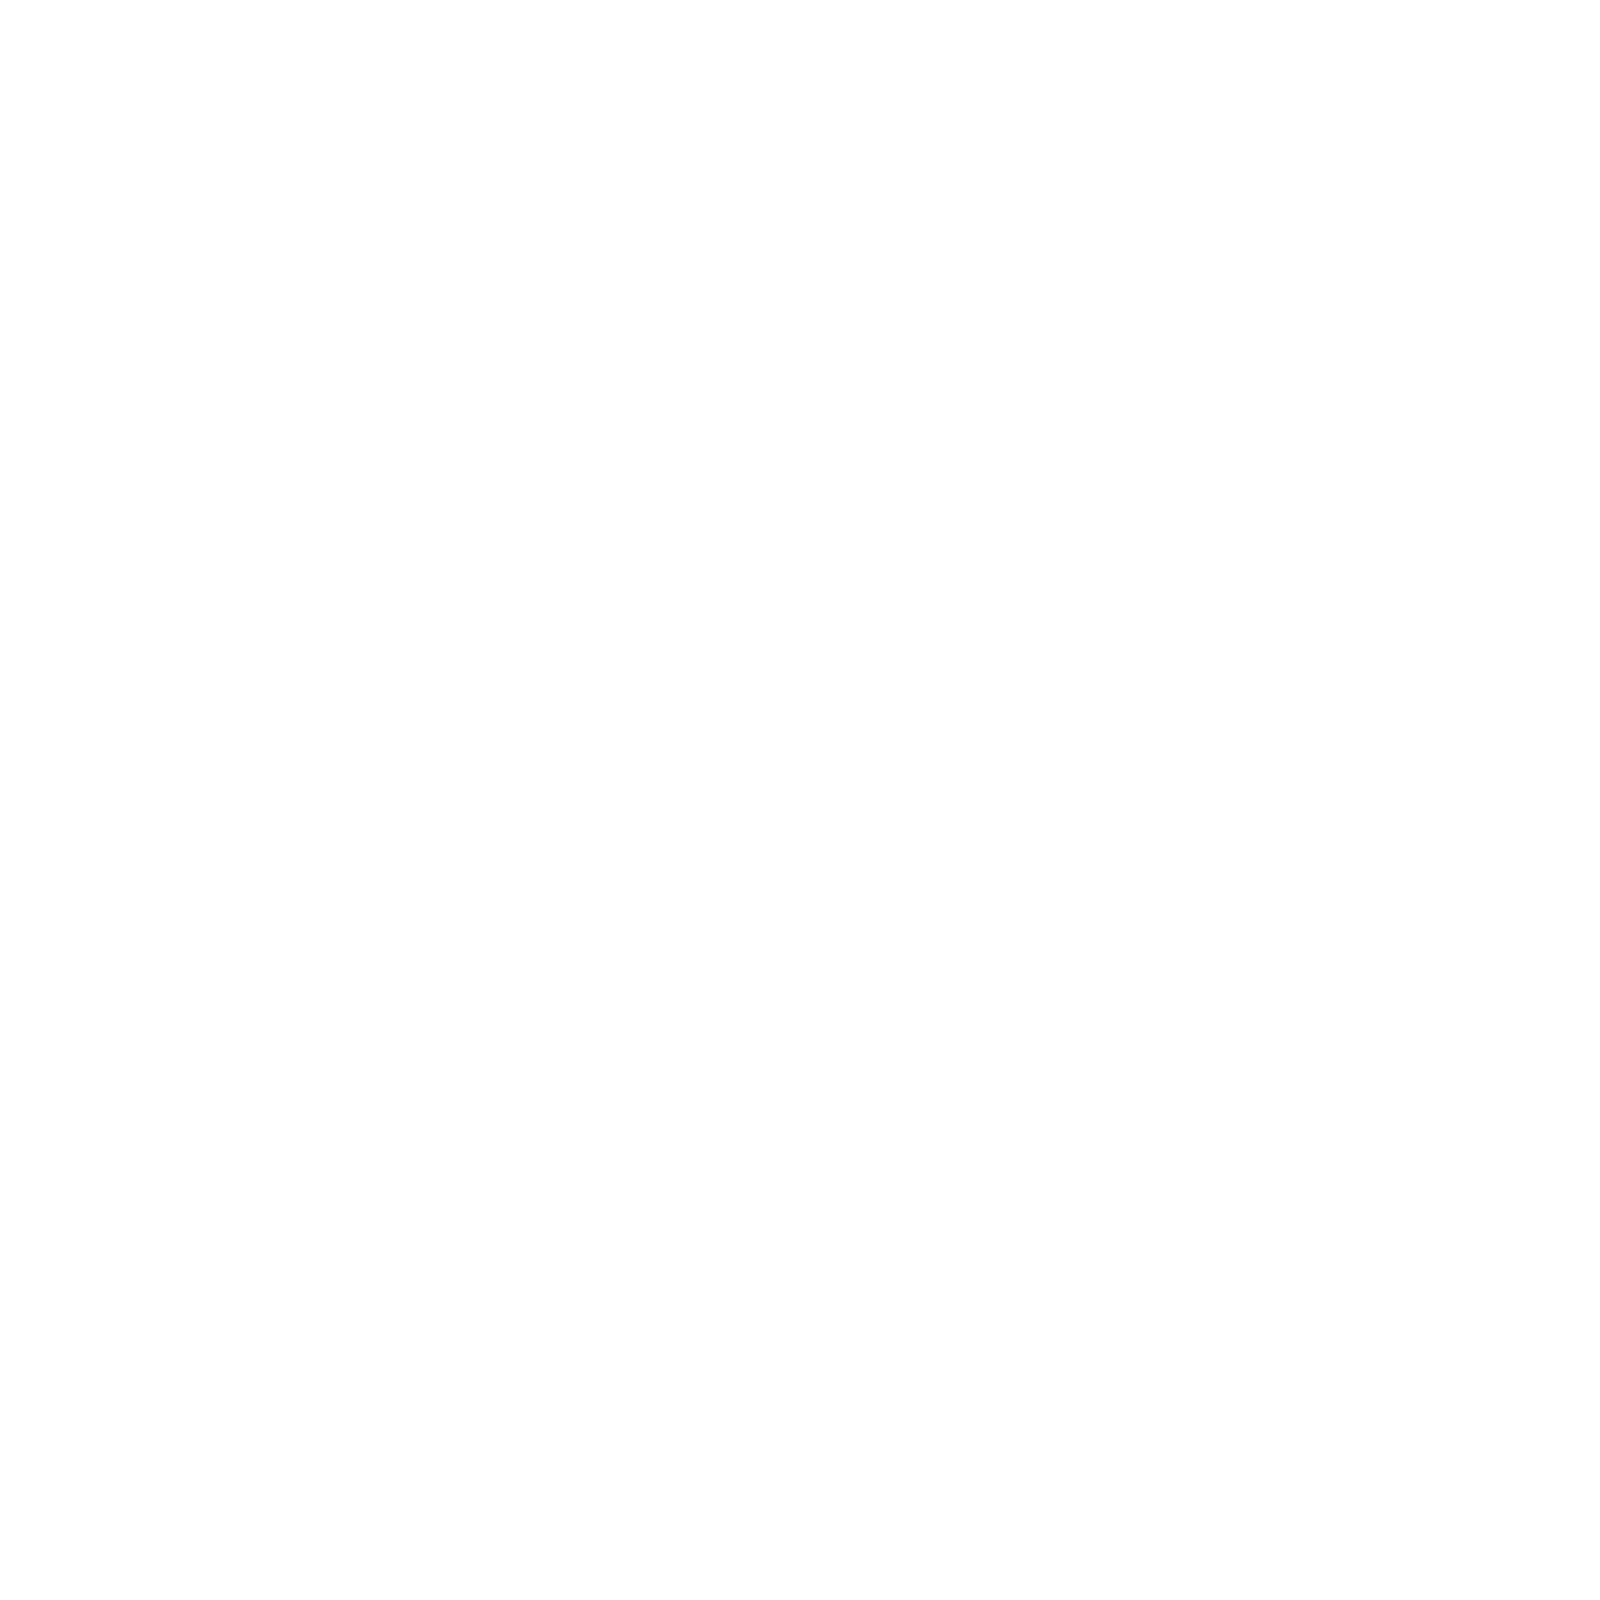 Troo-project-logo